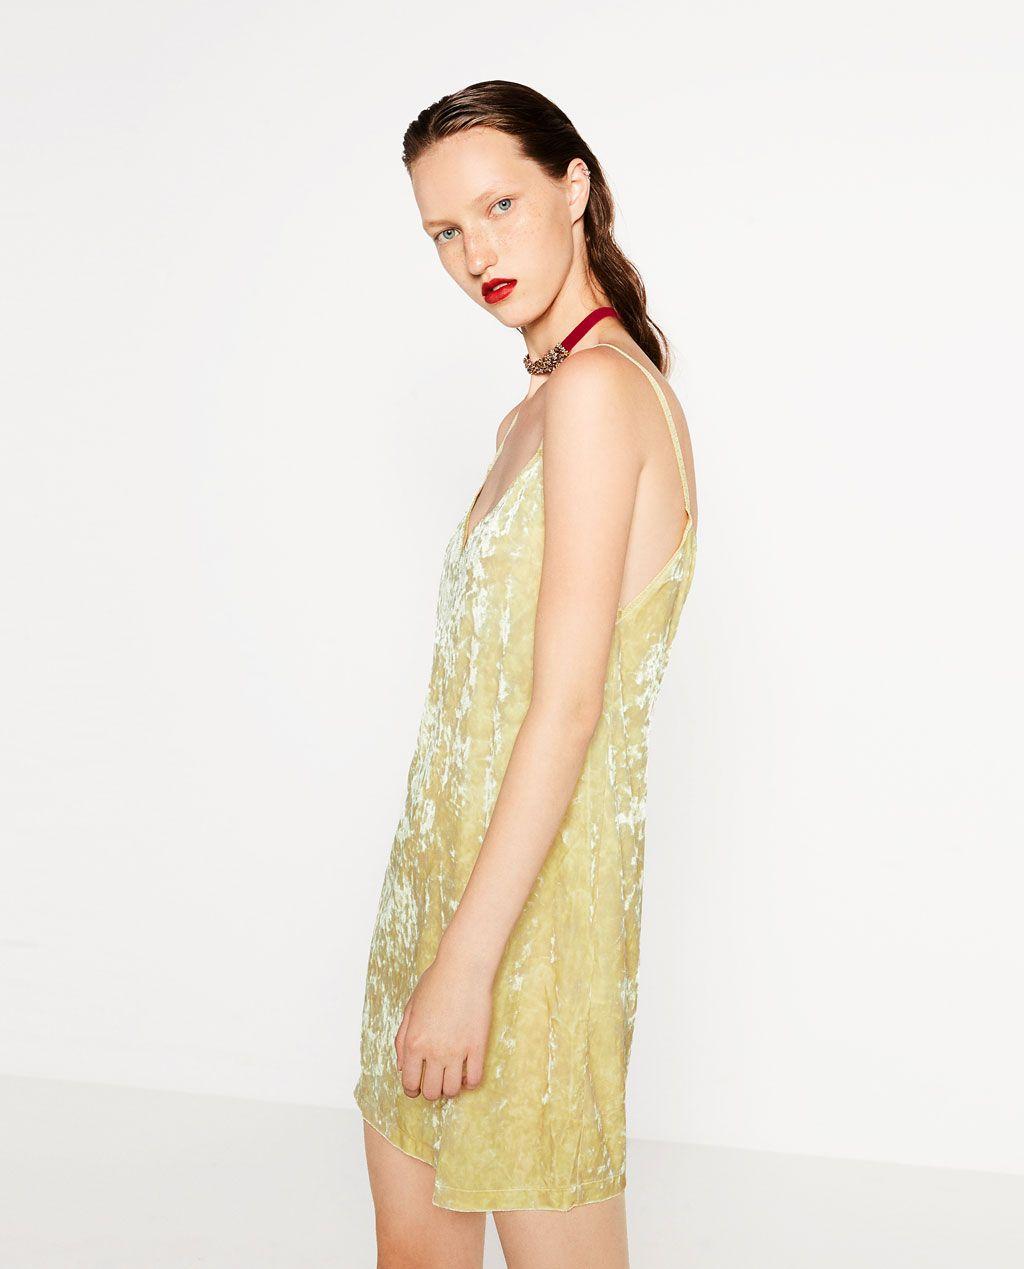 VELVET DRESS-DRESSES-WOMAN-COLLECTION AW16   ZARA Canada ...